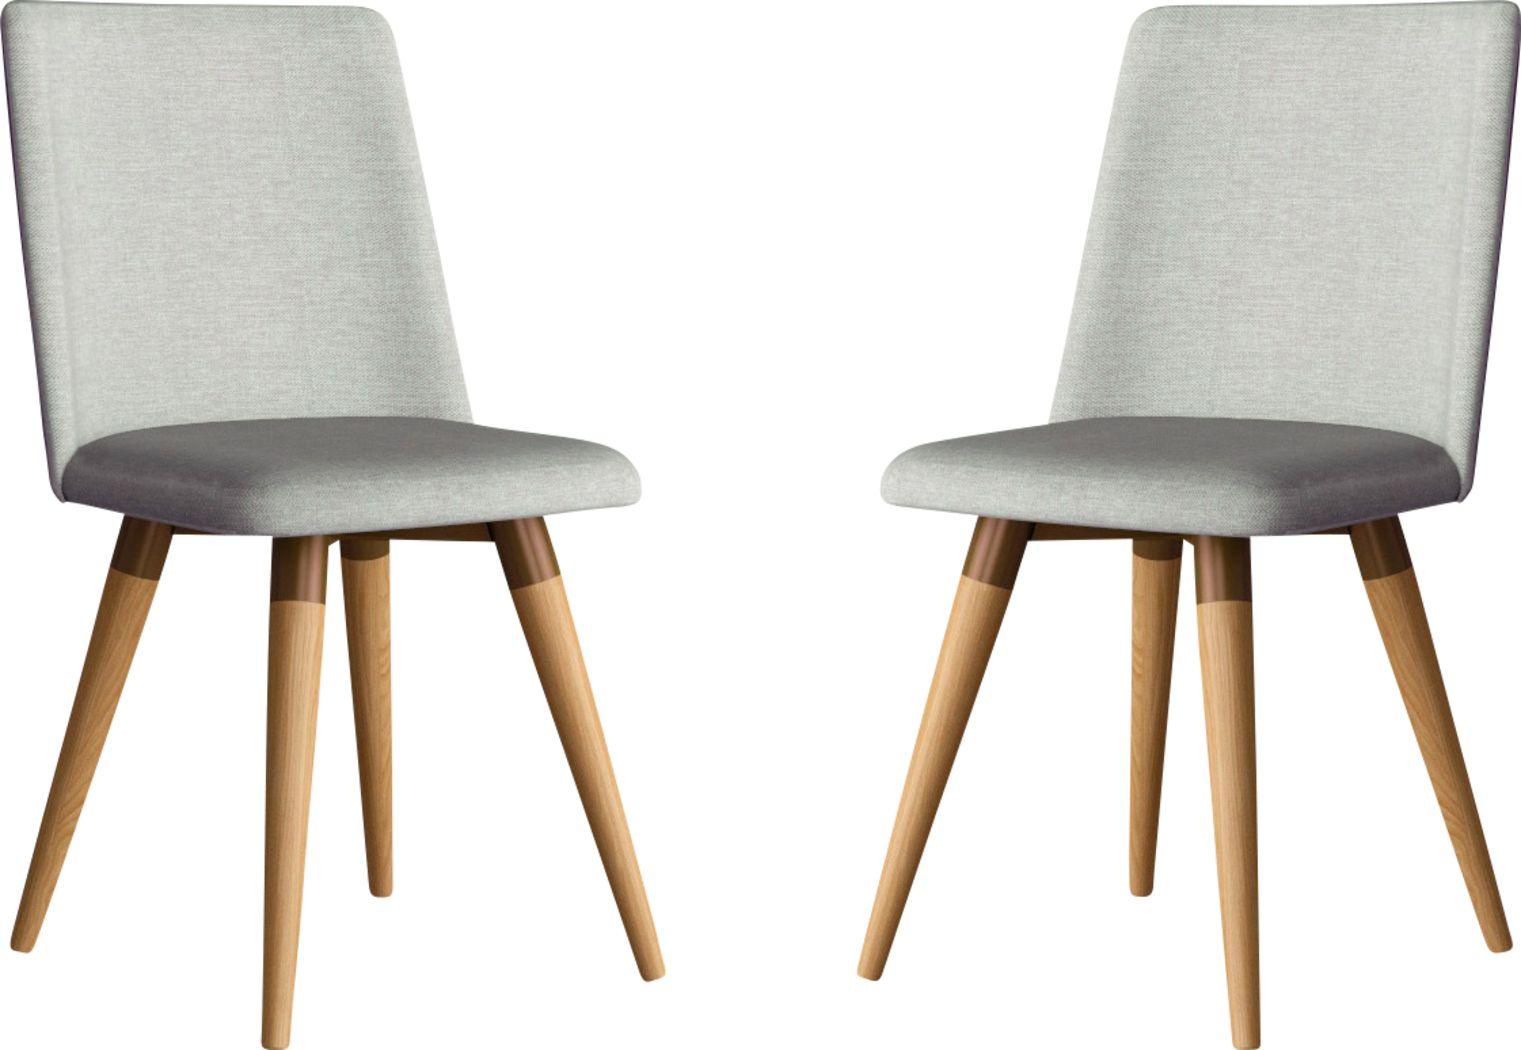 Abita Circle Gray Swivel Side Chair, Set of 2